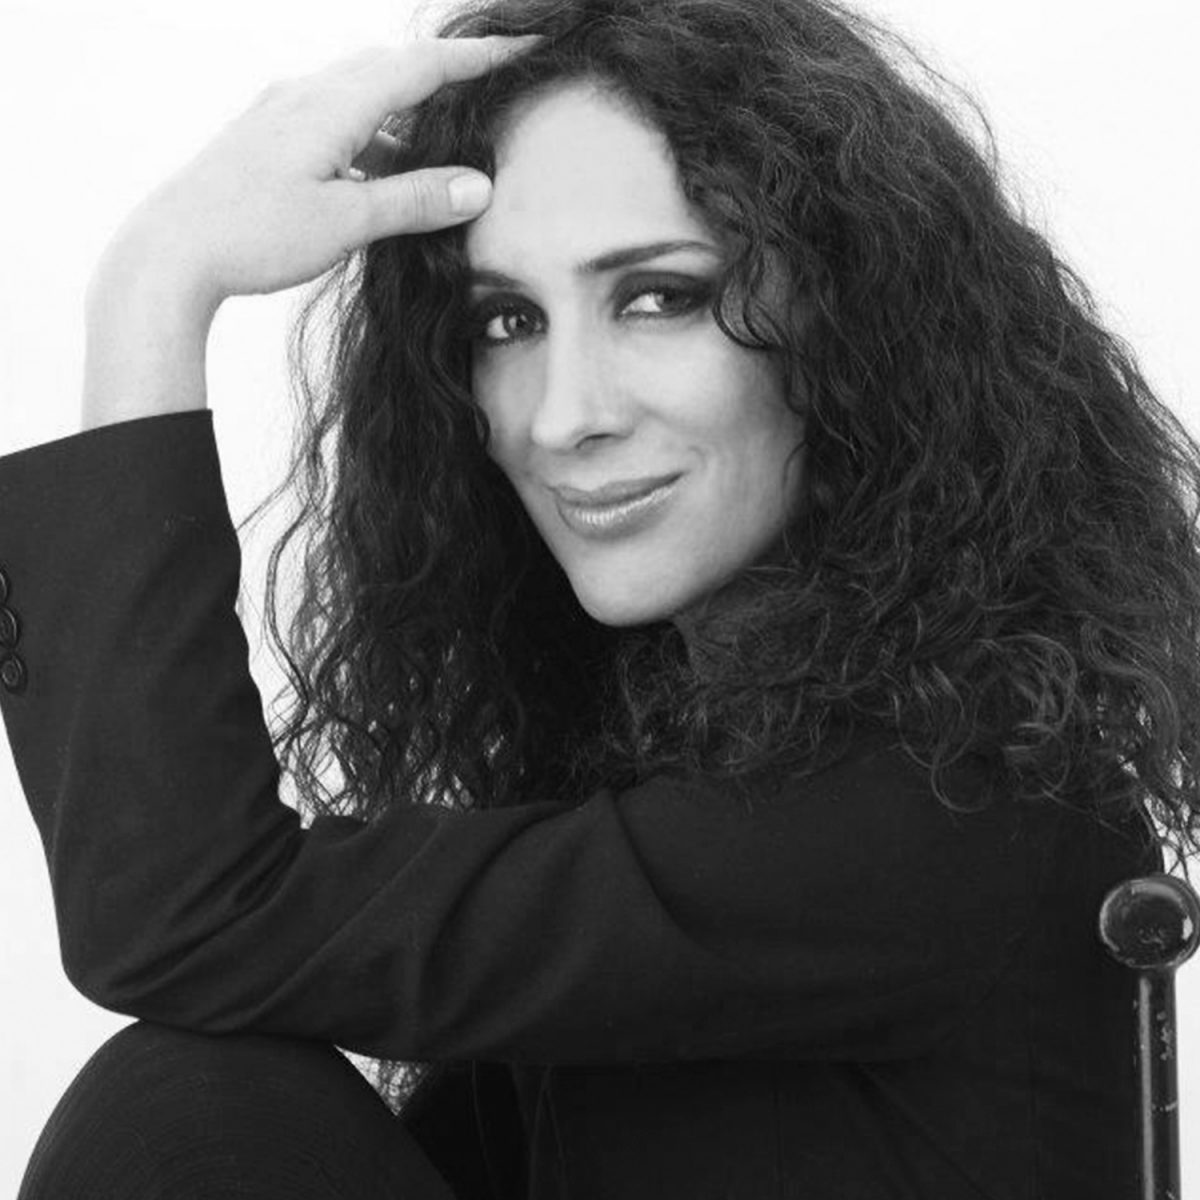 Cécica Bernasconi